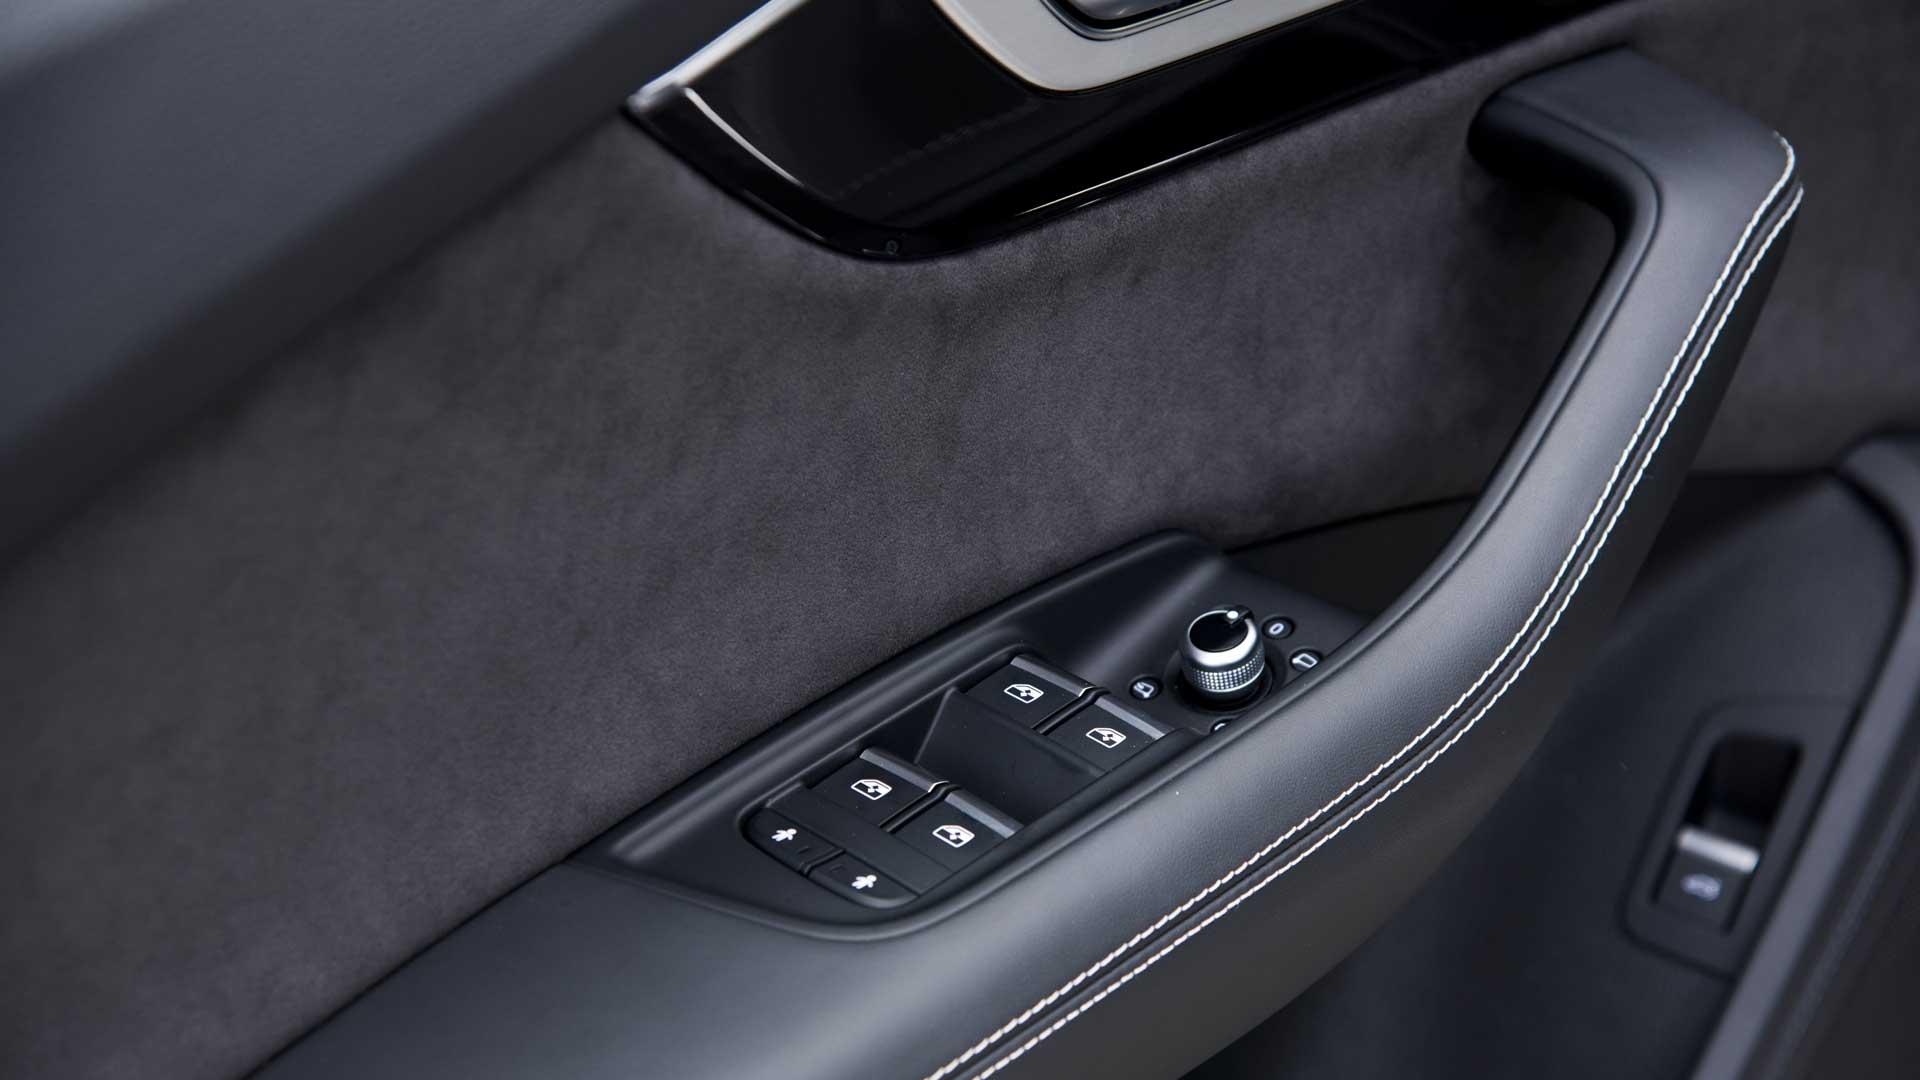 Audi Q7 2016 Technology Interior